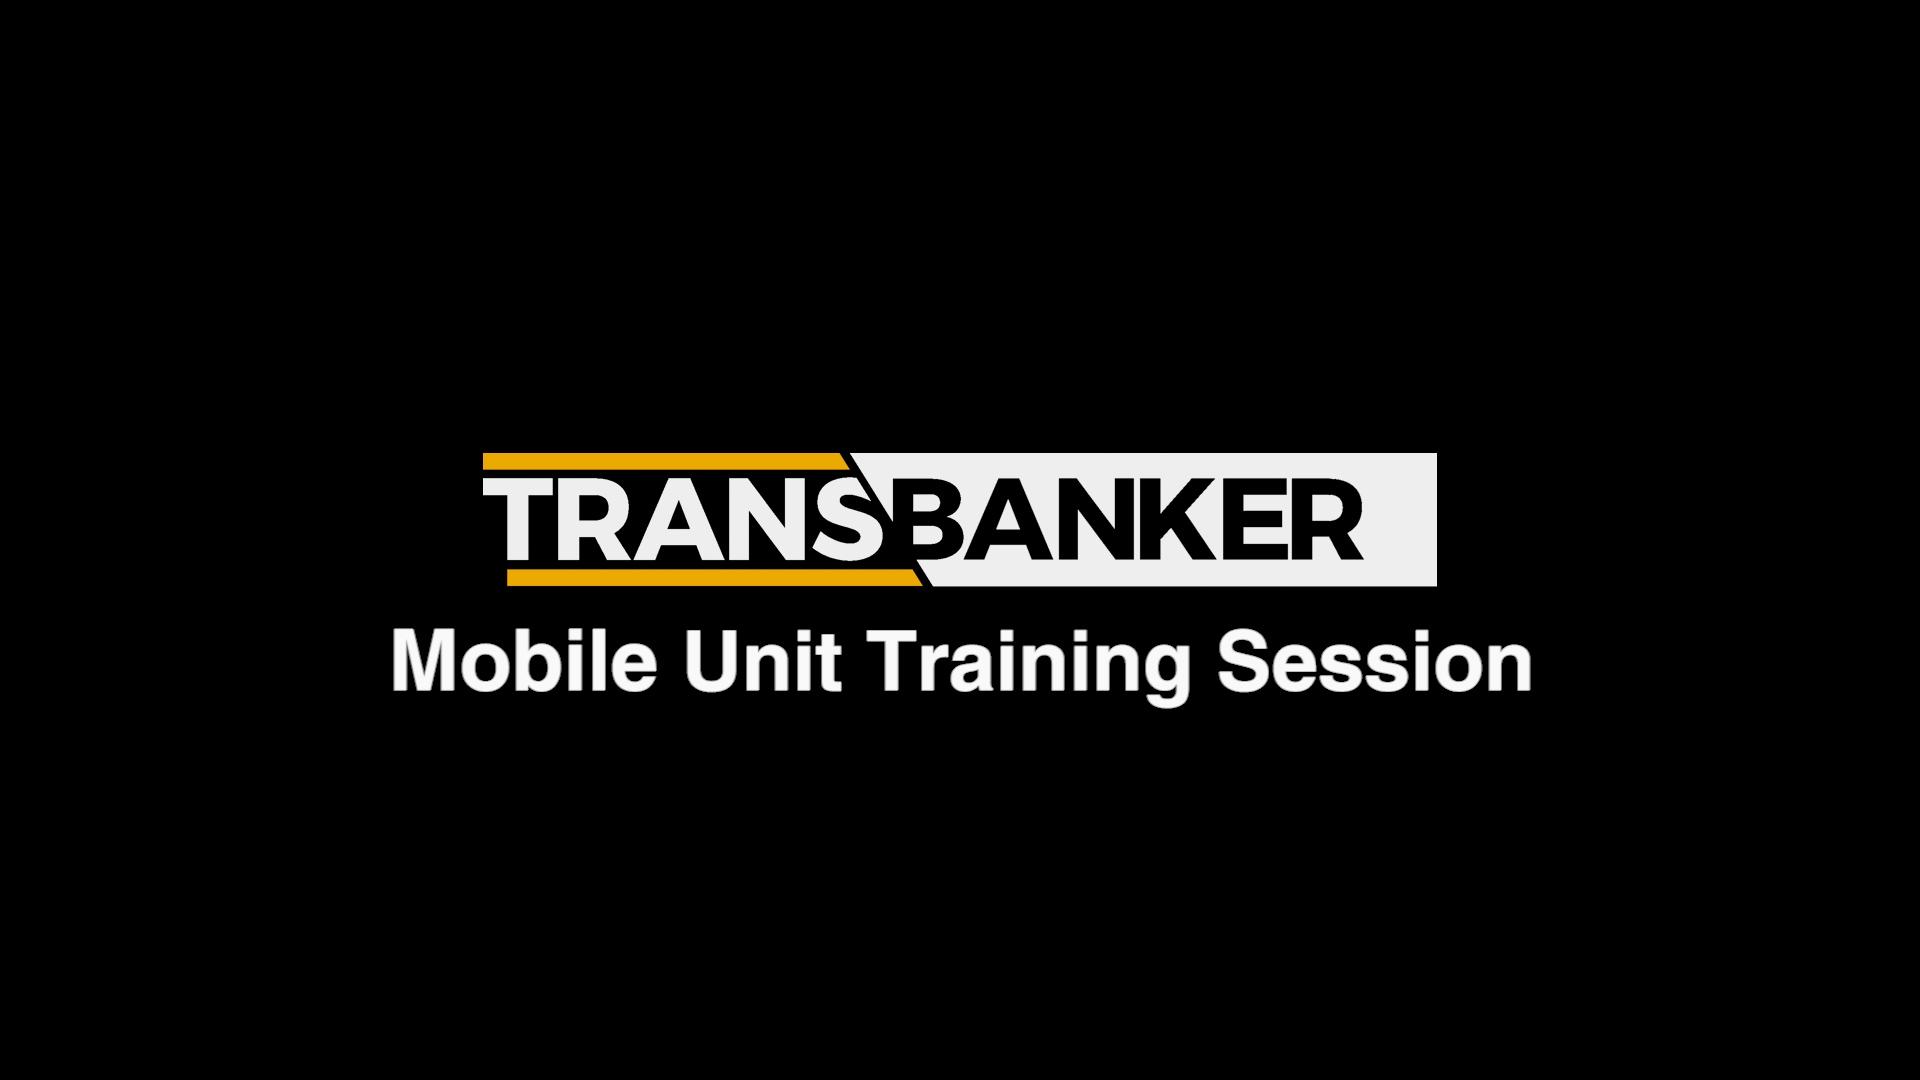 Transbanker Mobile Unit Training Session